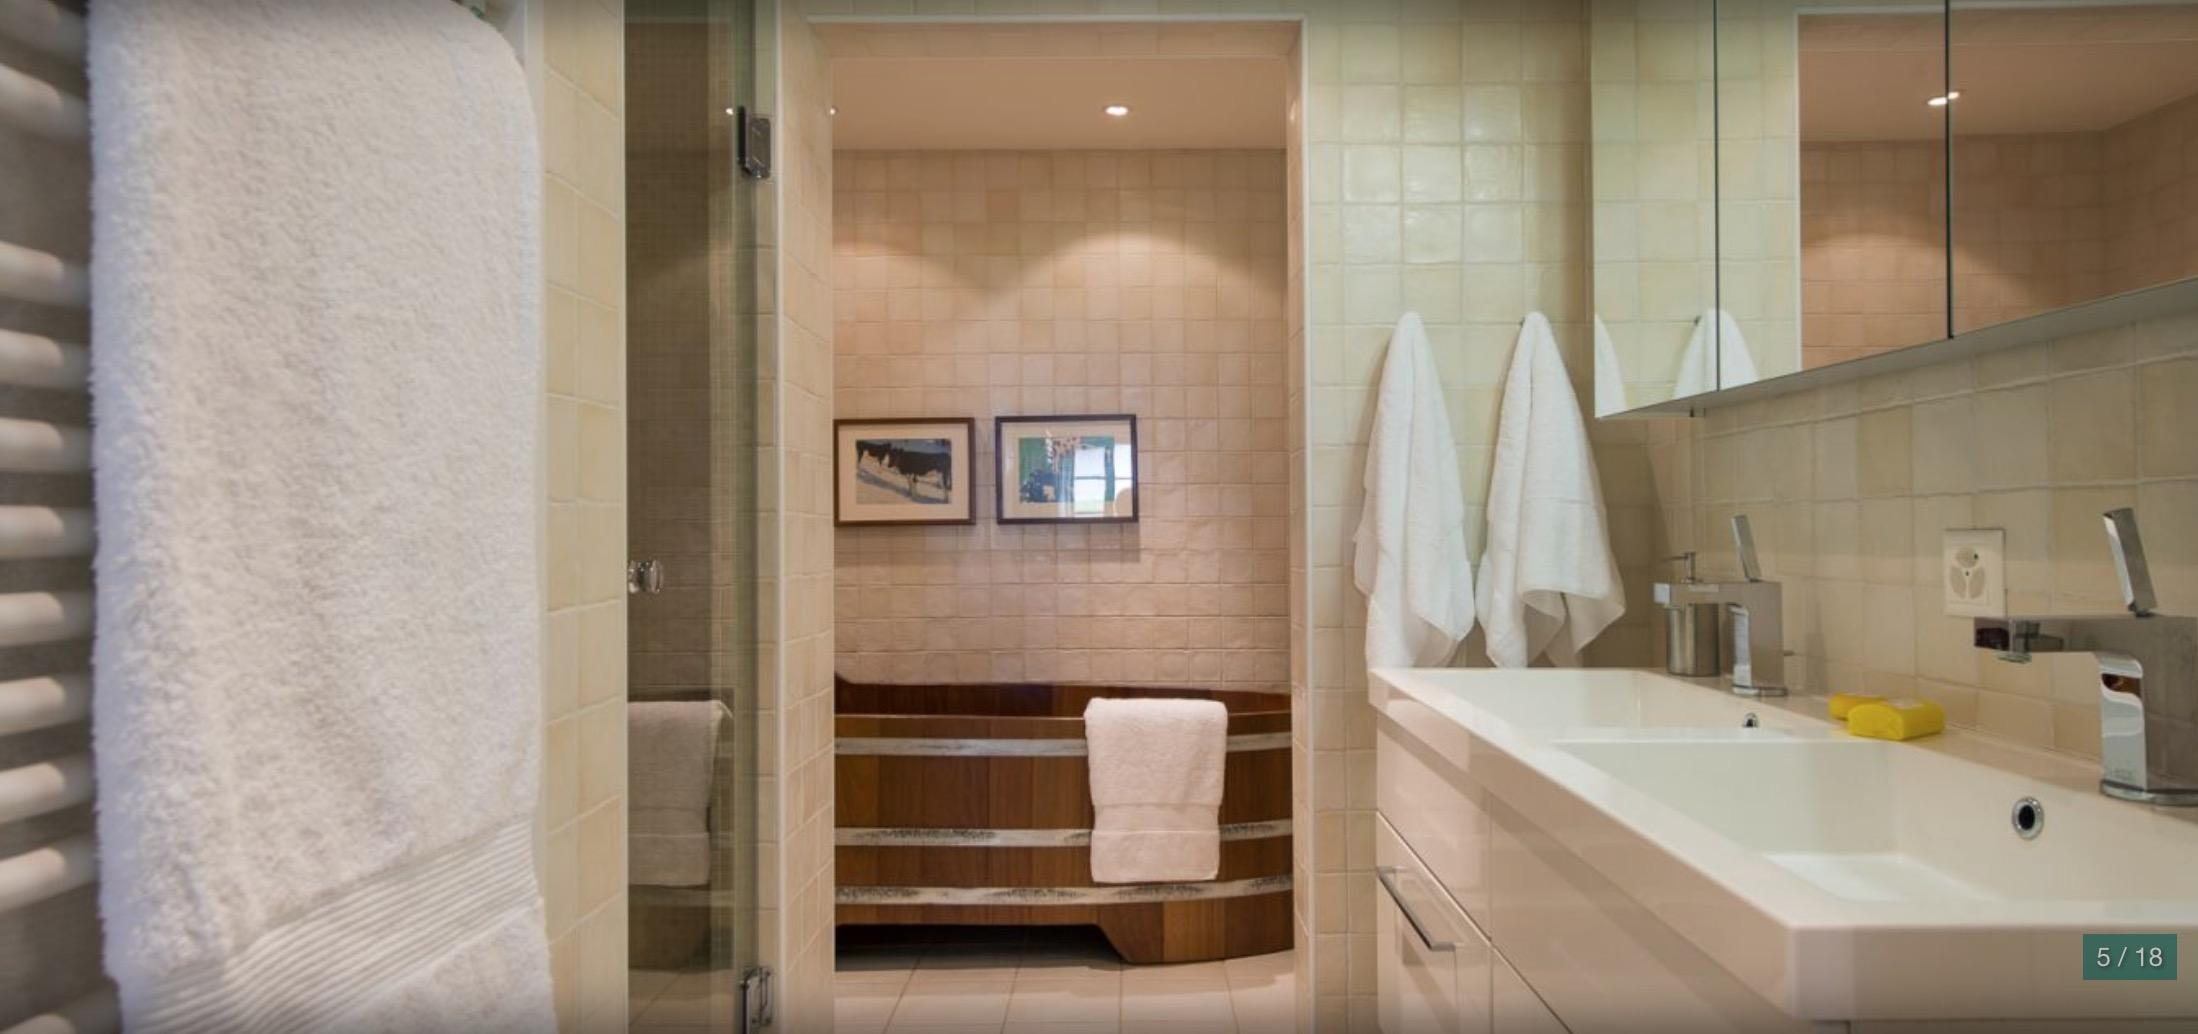 Master bathroom of pentahouse property Fayard